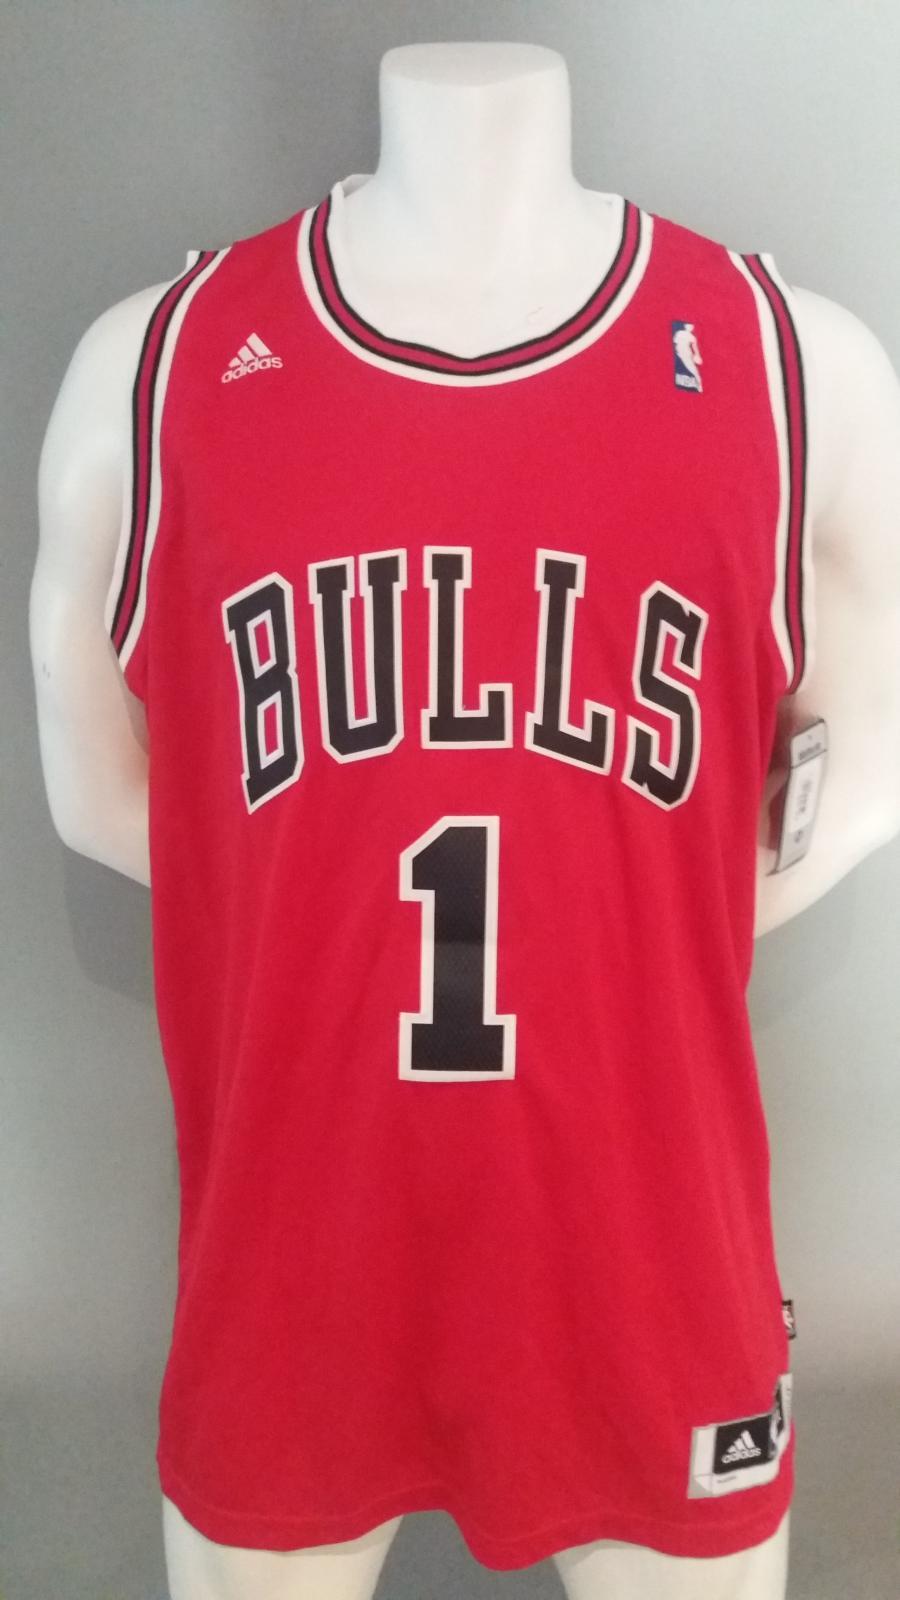 Jersey - Swingman - Hombre - Derrick Rose - Chicago Bulls - Road - Adidas